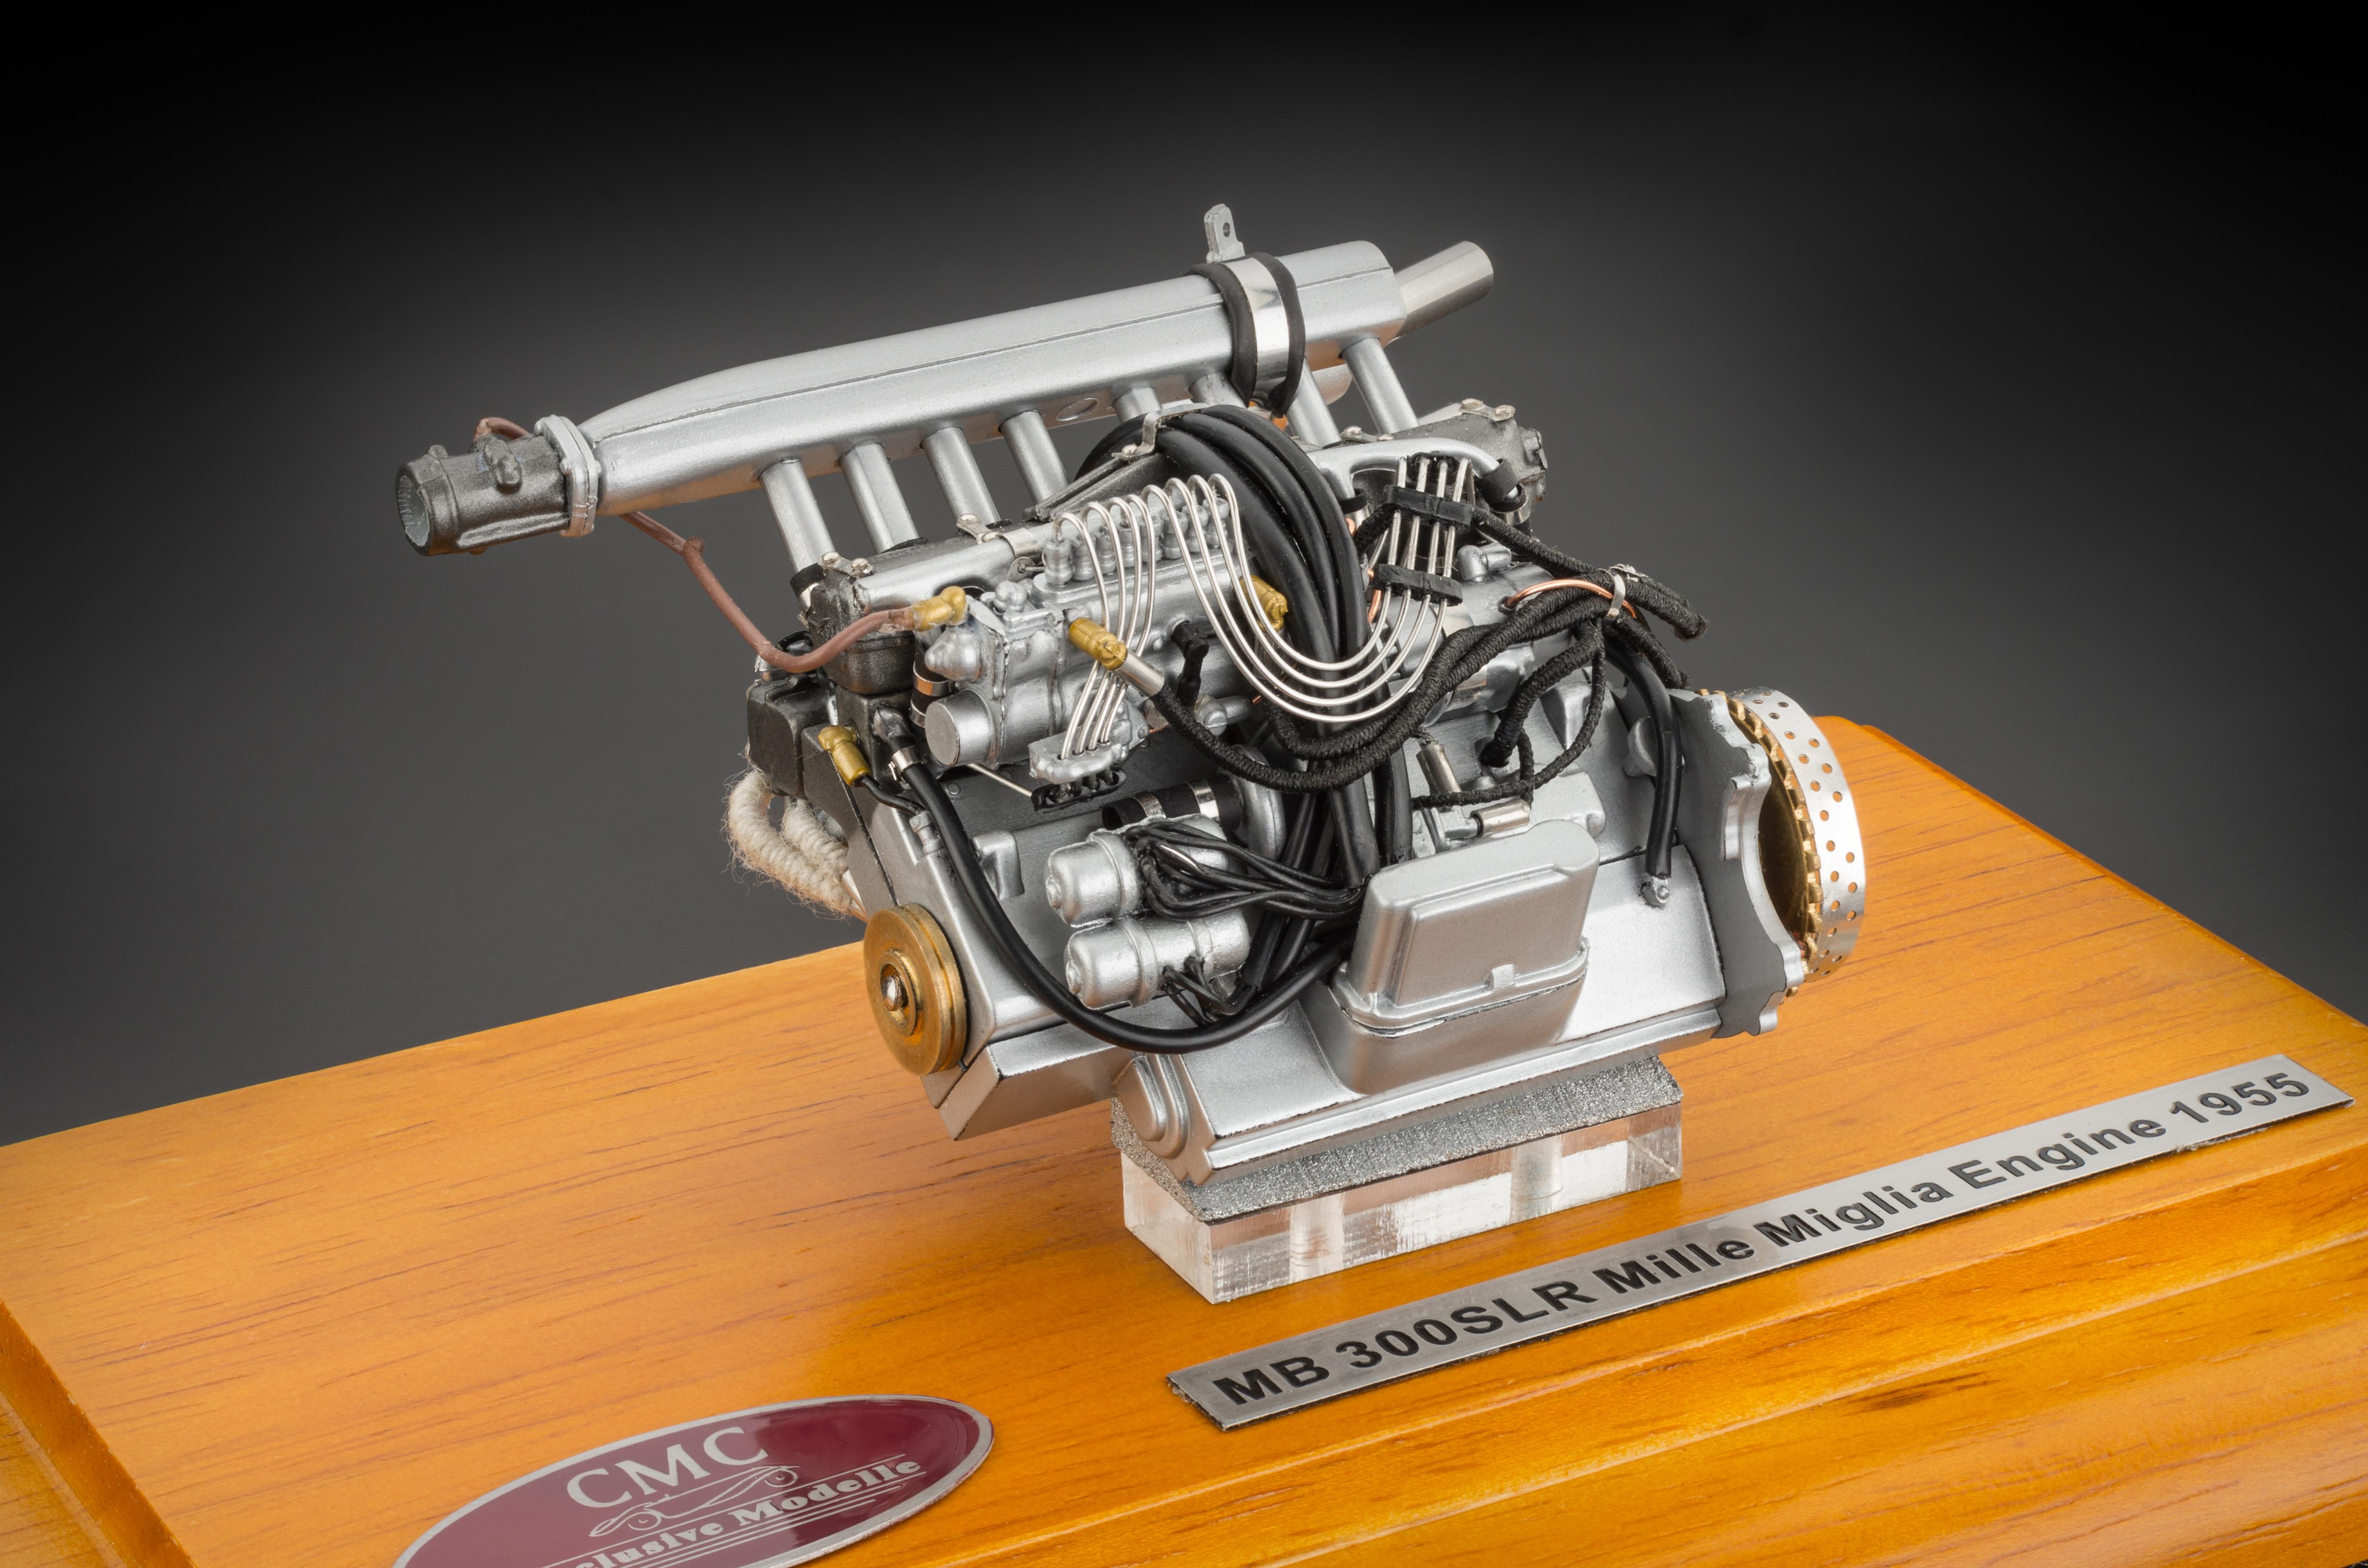 Cmc Mercedes Benz 300 Slr Engine With Display Showcase Cmc Model